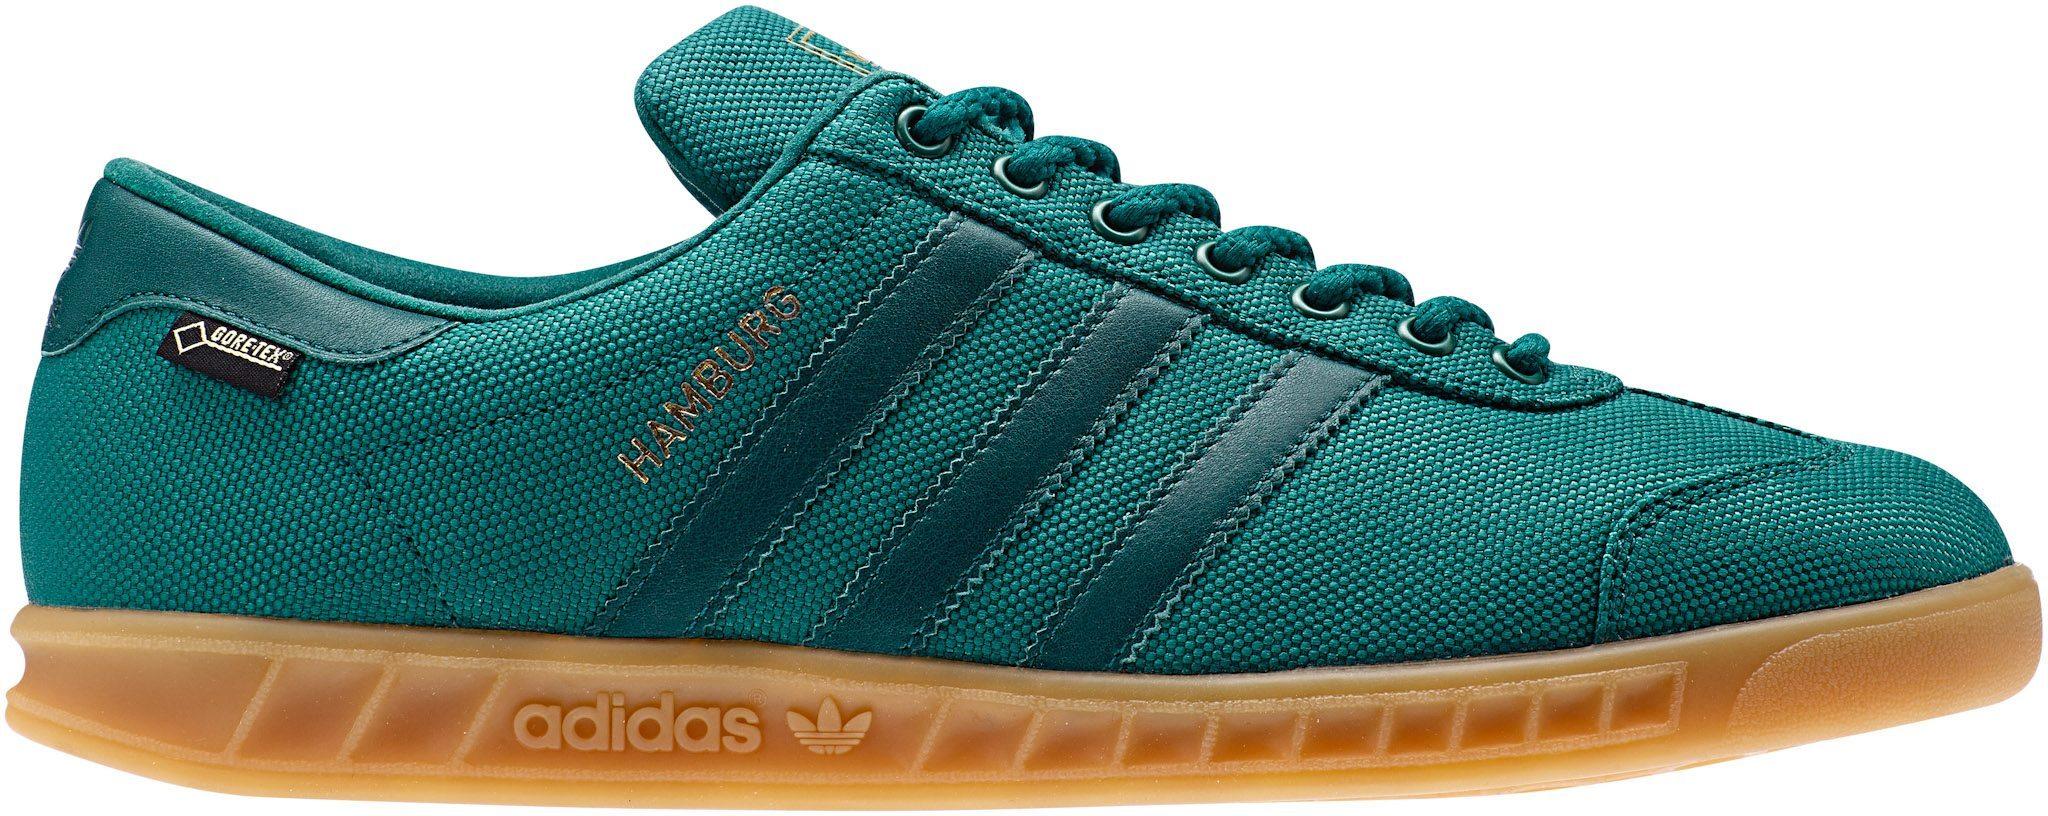 adidas Originals Hamburg GTX 7